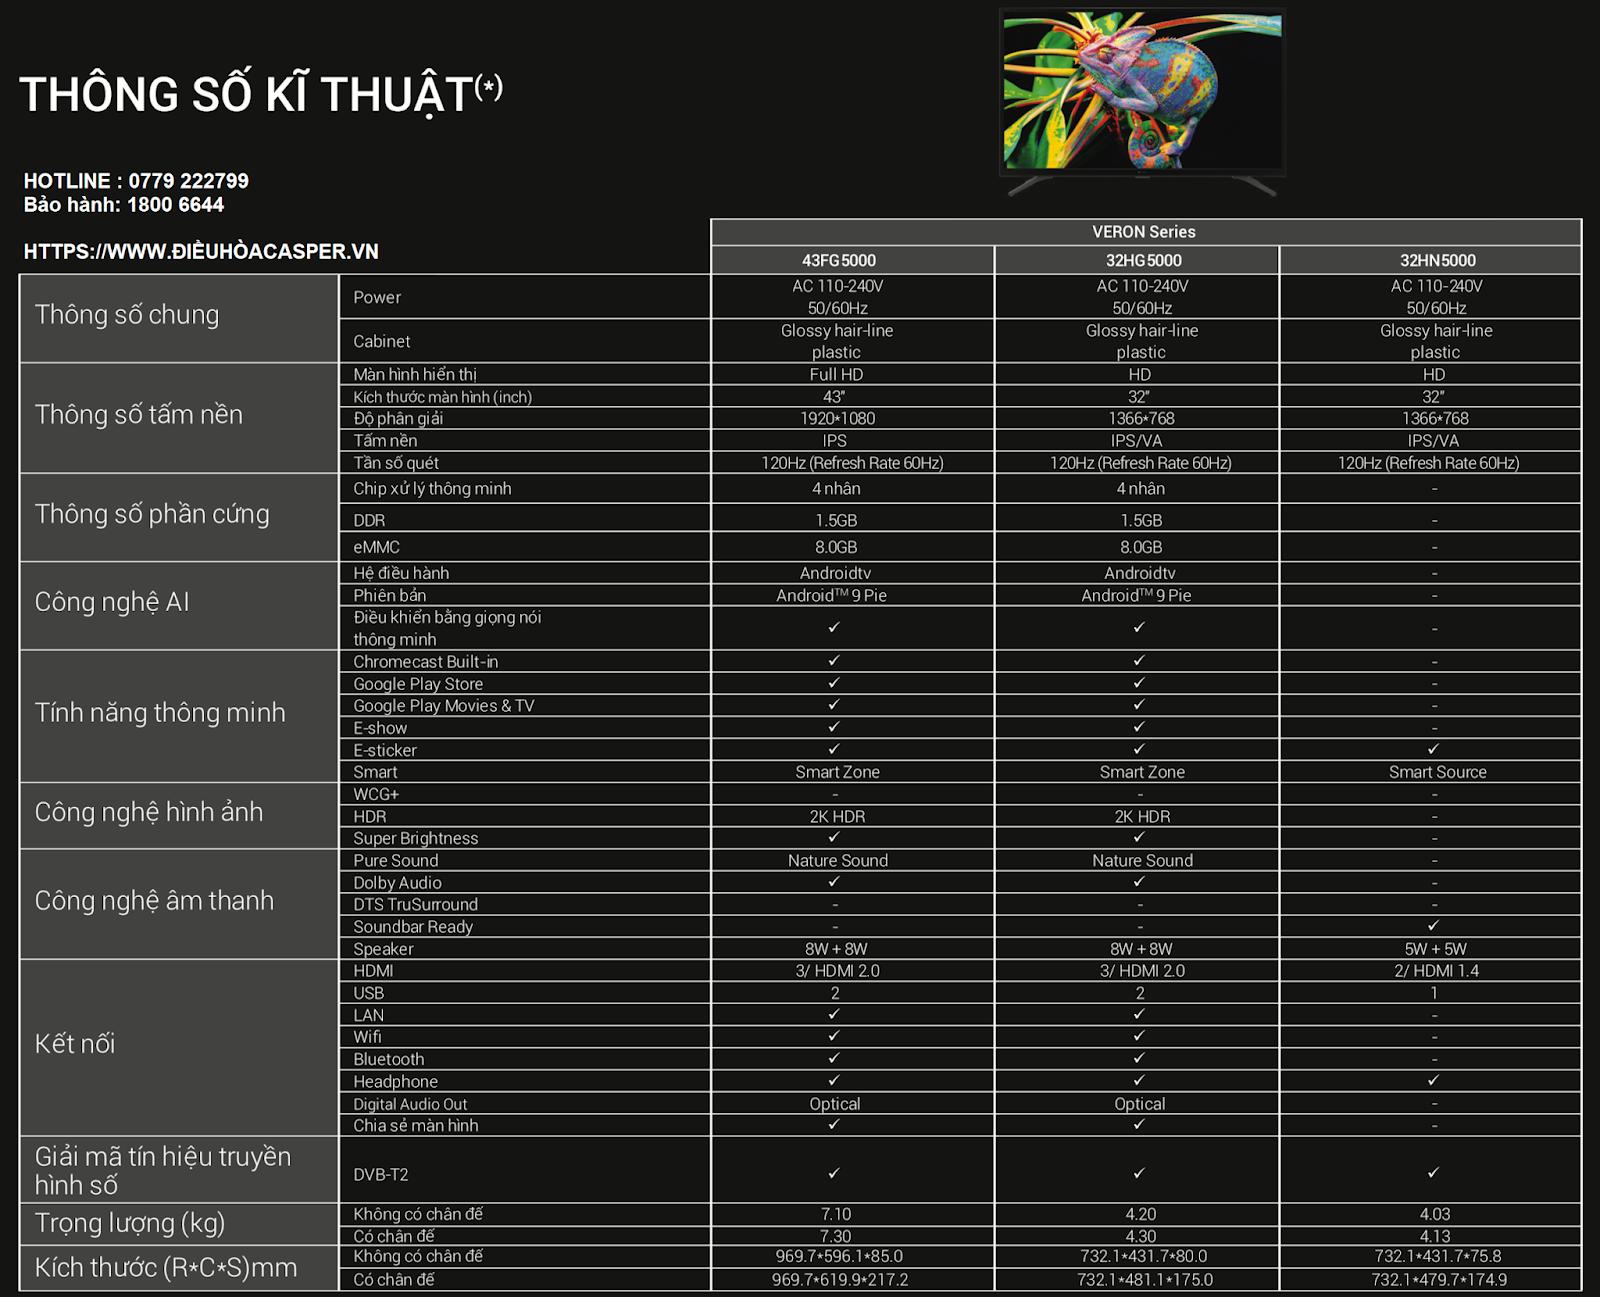 THÔNG SỐ KỸ THUẬT SMART TIVI CASPER 43FG5000